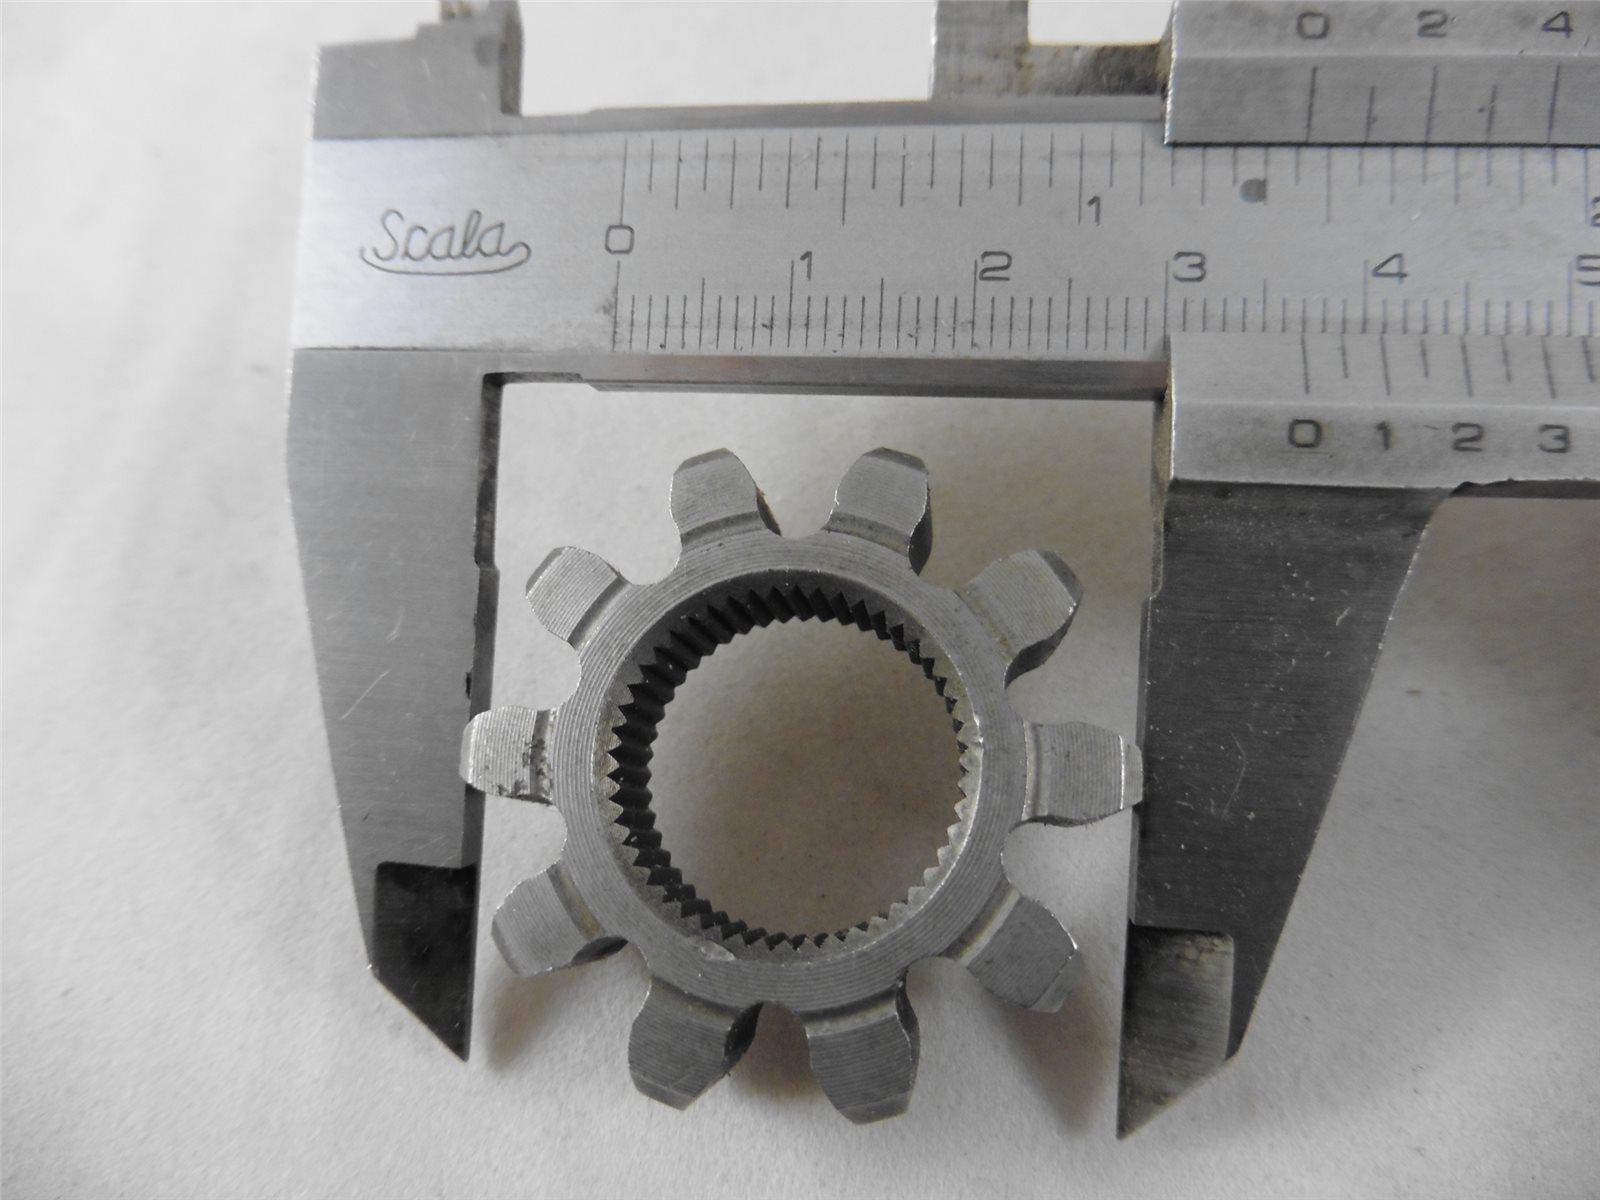 Zahnrad 1 Gang Peerless Getriebe Rasentraktor Traktor Schaltgetriebe MST 205 540